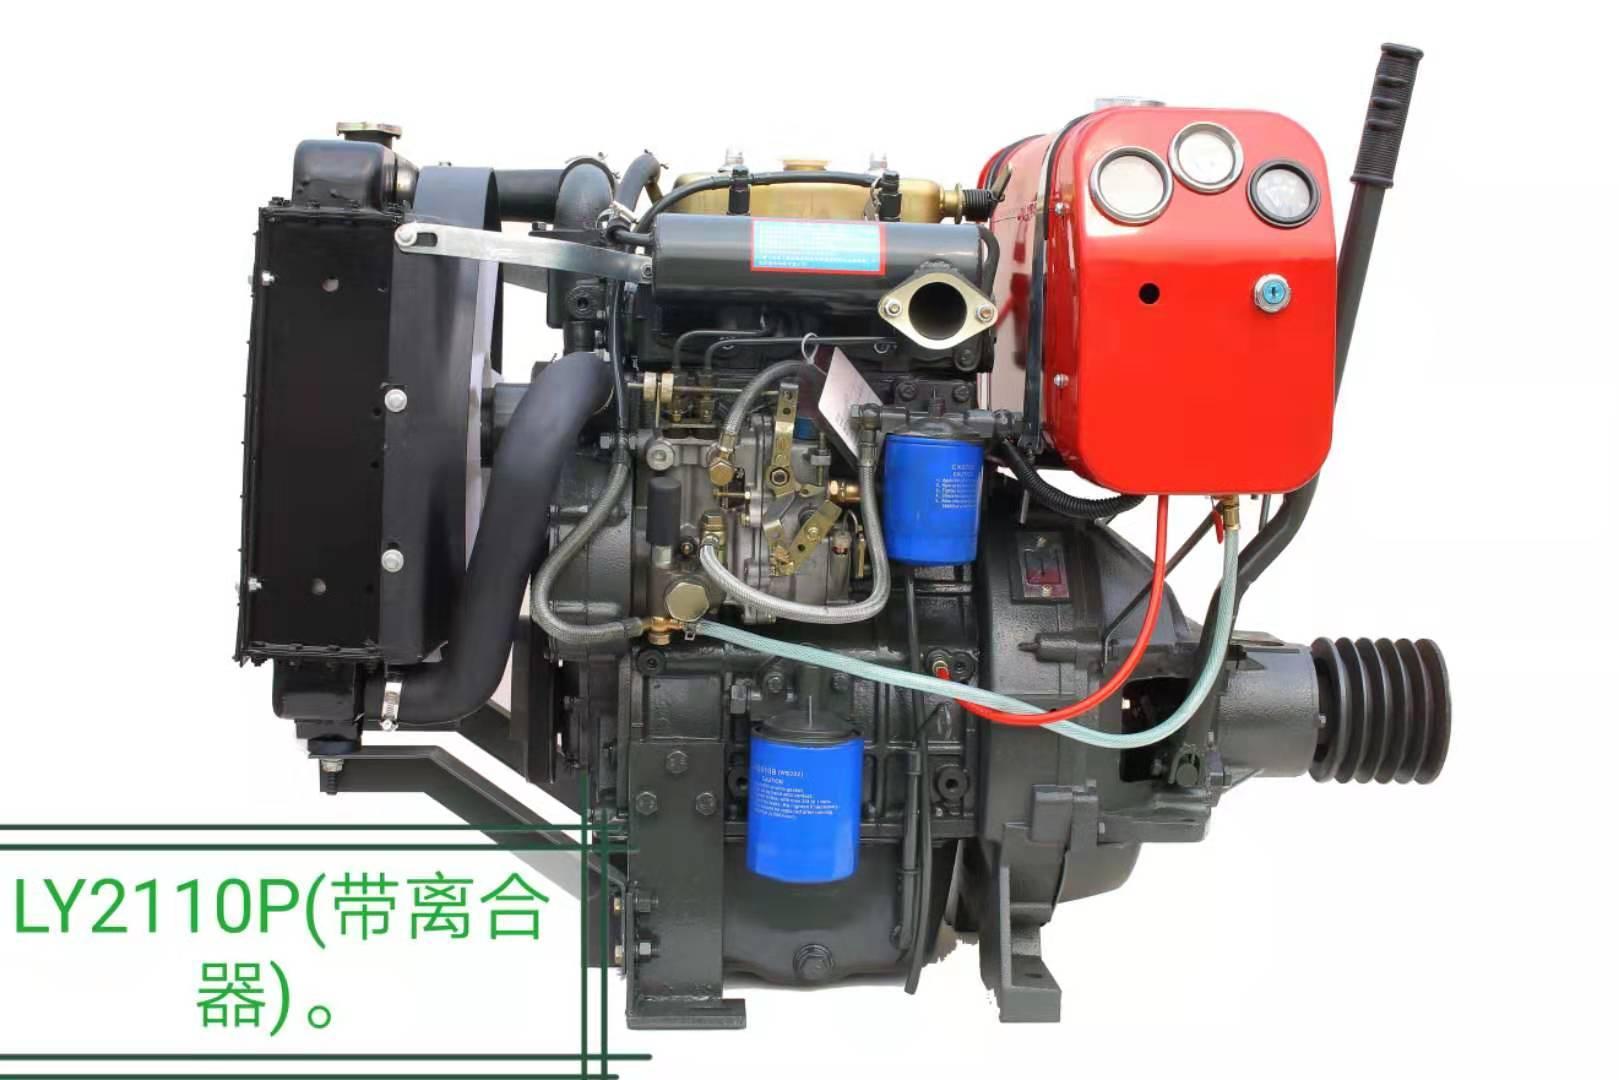 2 cylinder diesel engine for power drive